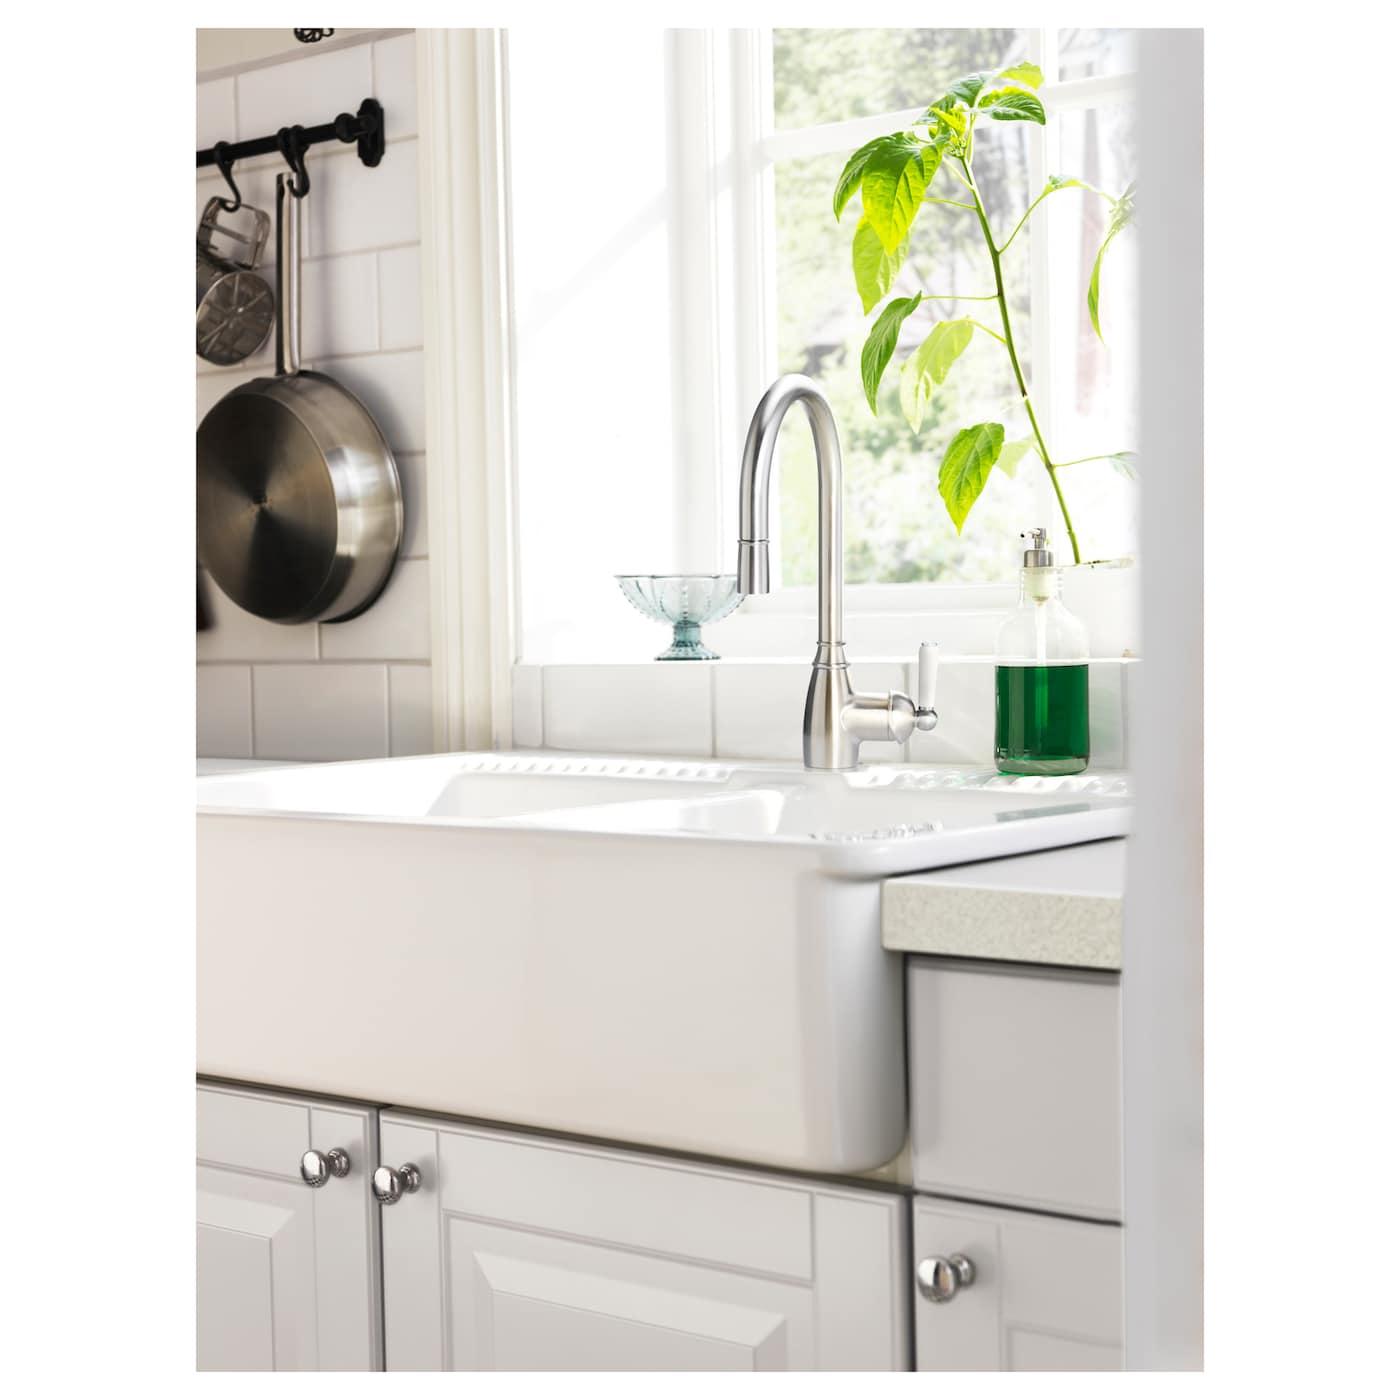 ELVERDAM Kitchen Mixer Tap Stainless Steel Colour